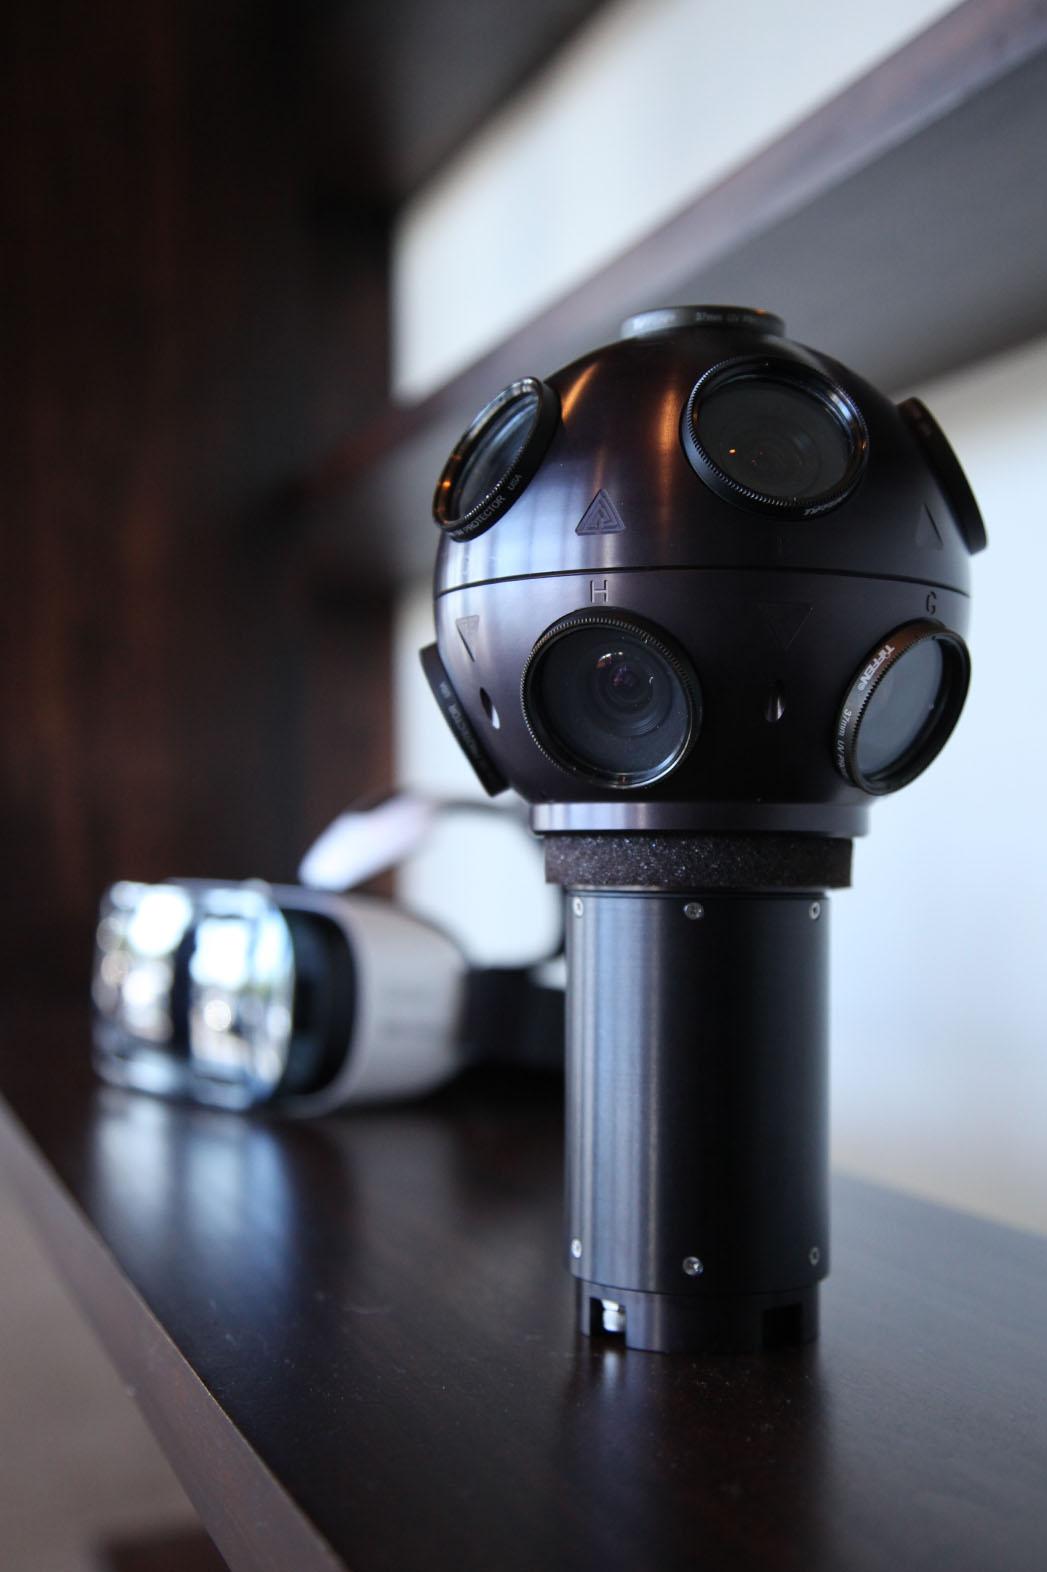 Immersive Media 360-degree camera - P 2015